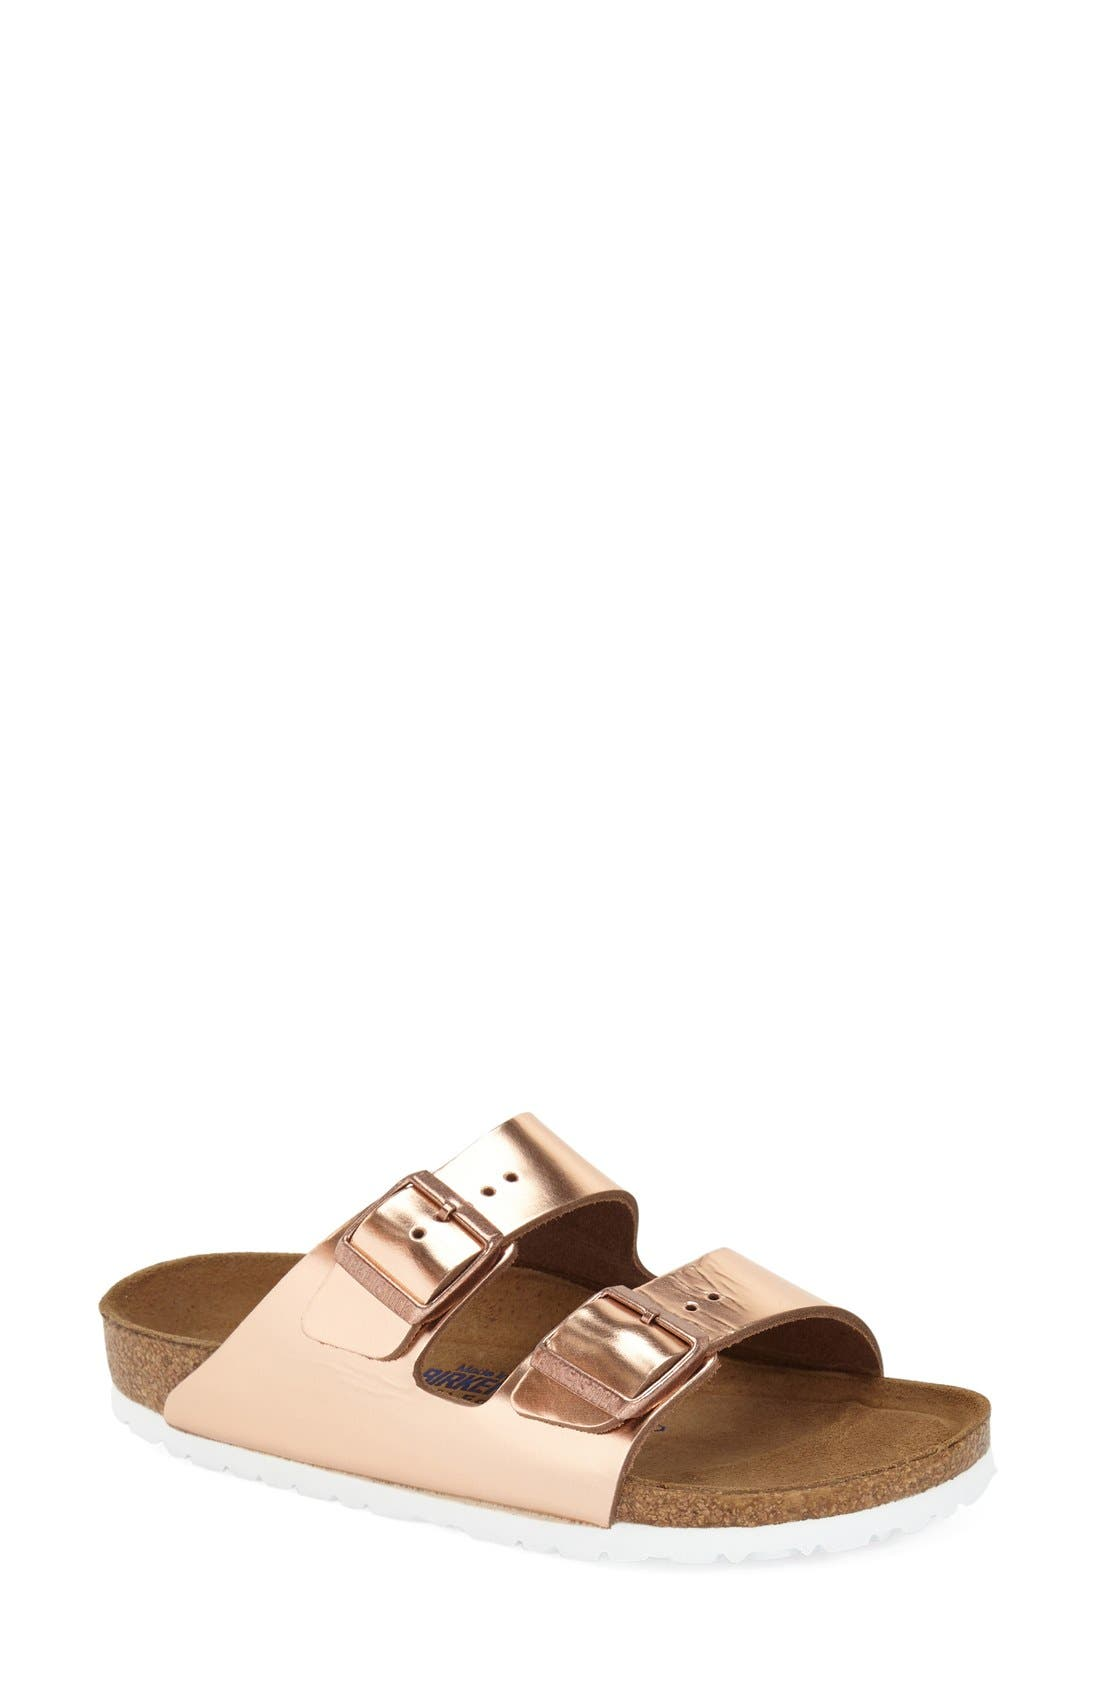 Alternate Image 1 Selected - Birkenstock 'Arizona' Patent Leather Sandal (Women)